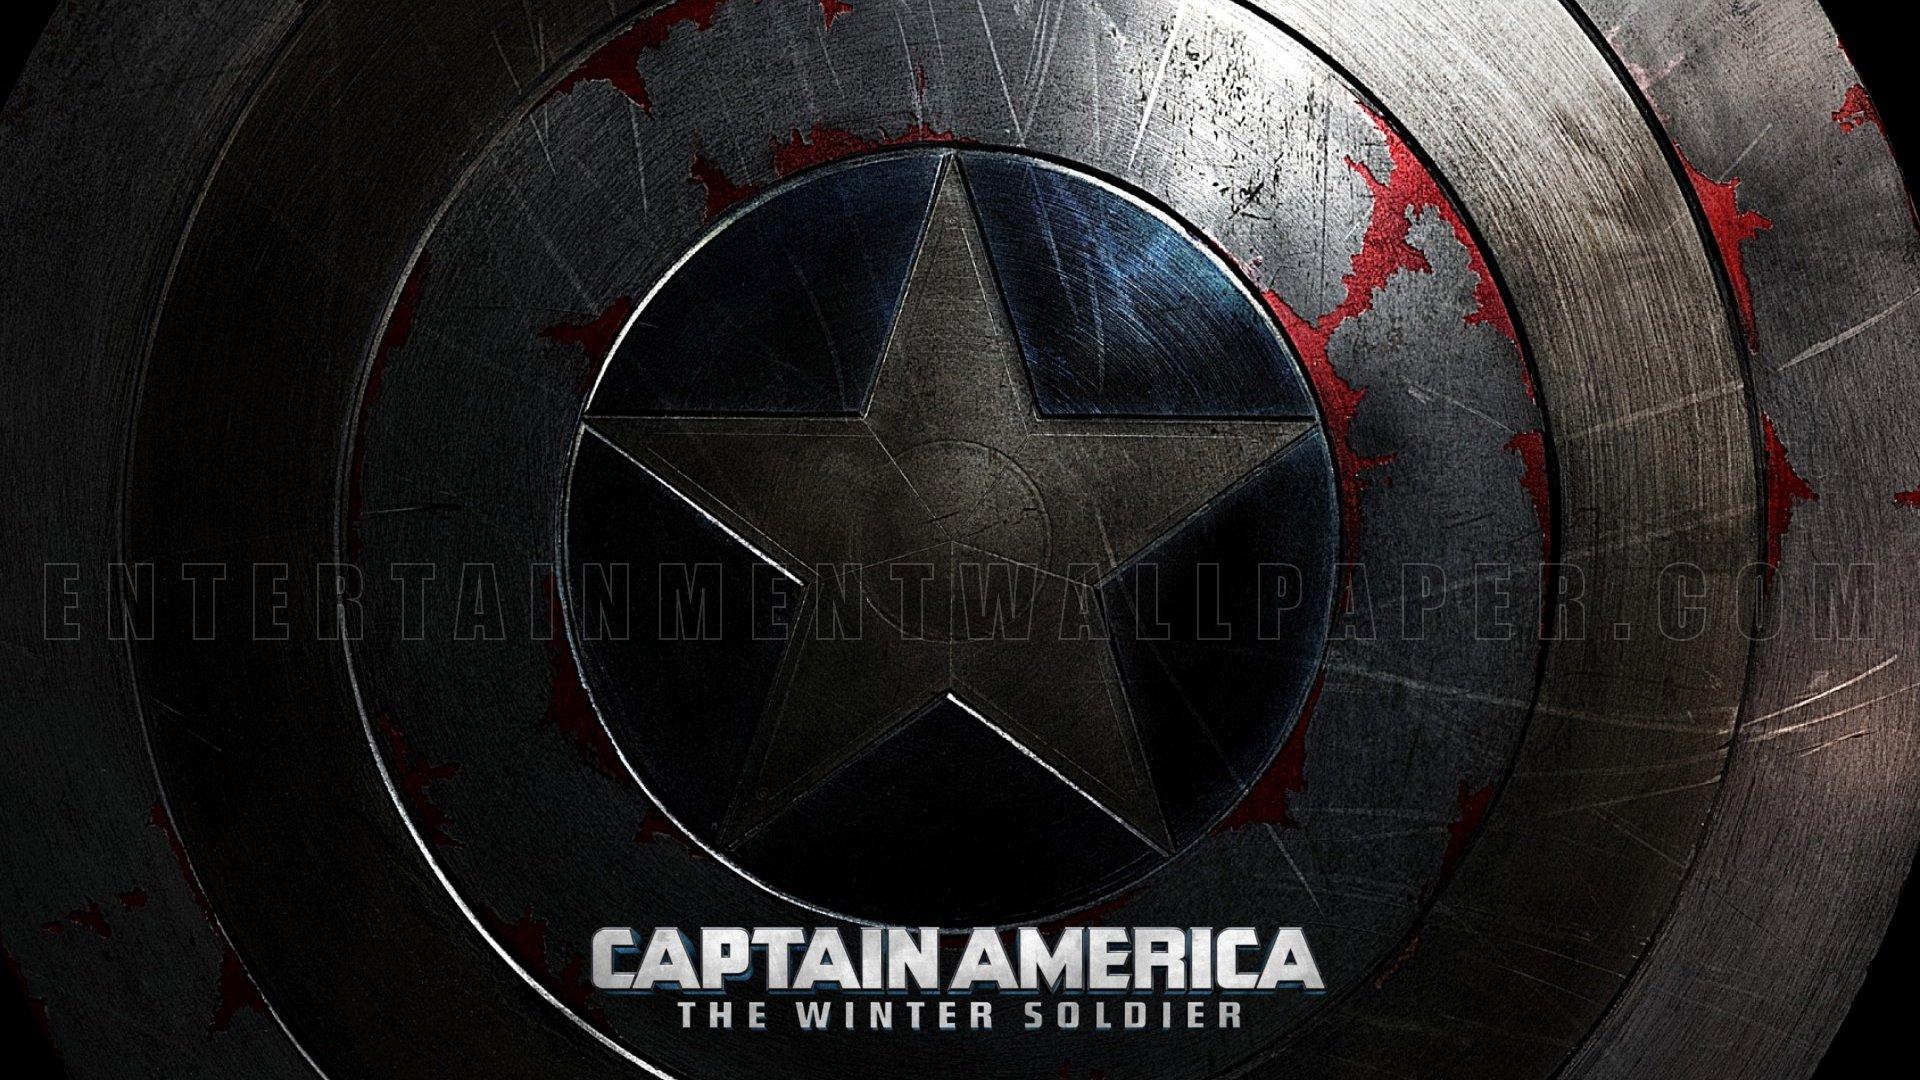 Captain America The Winter Soldier Wallpaper   10040989 1920x1080 1920x1080